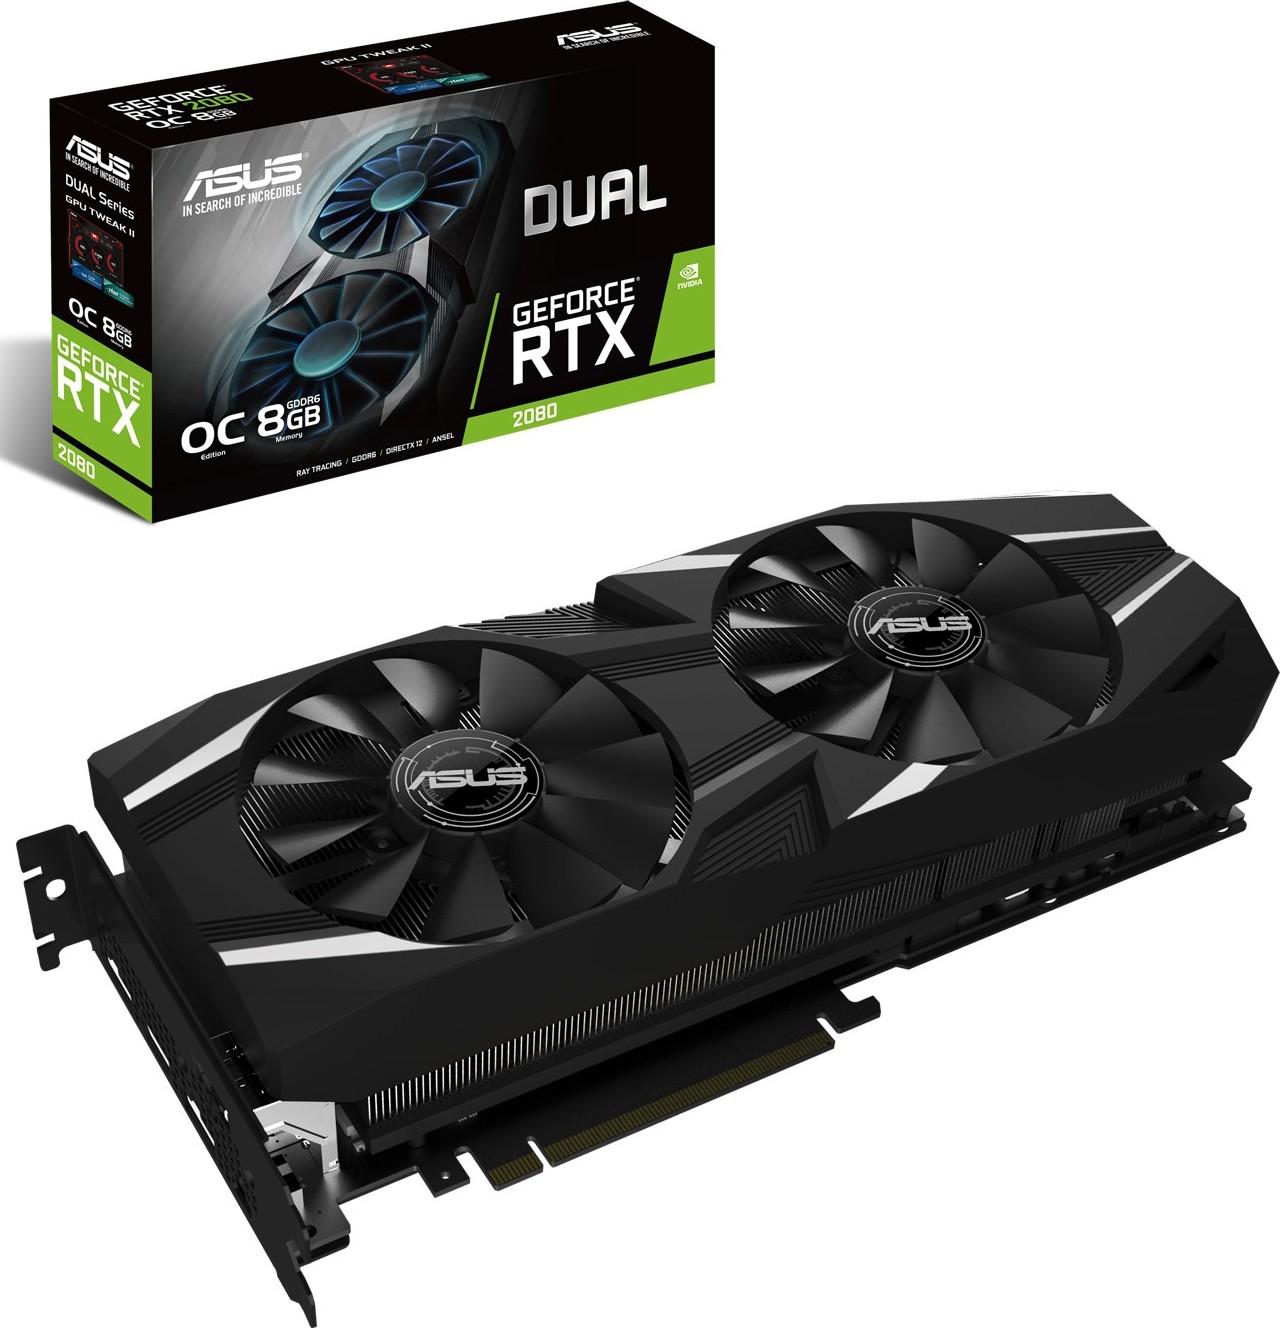 ASUS NVIDIA GeForce RTX 2080 8GB DUAL OC Turing Graphics Card 90YV0C30  M0NM00